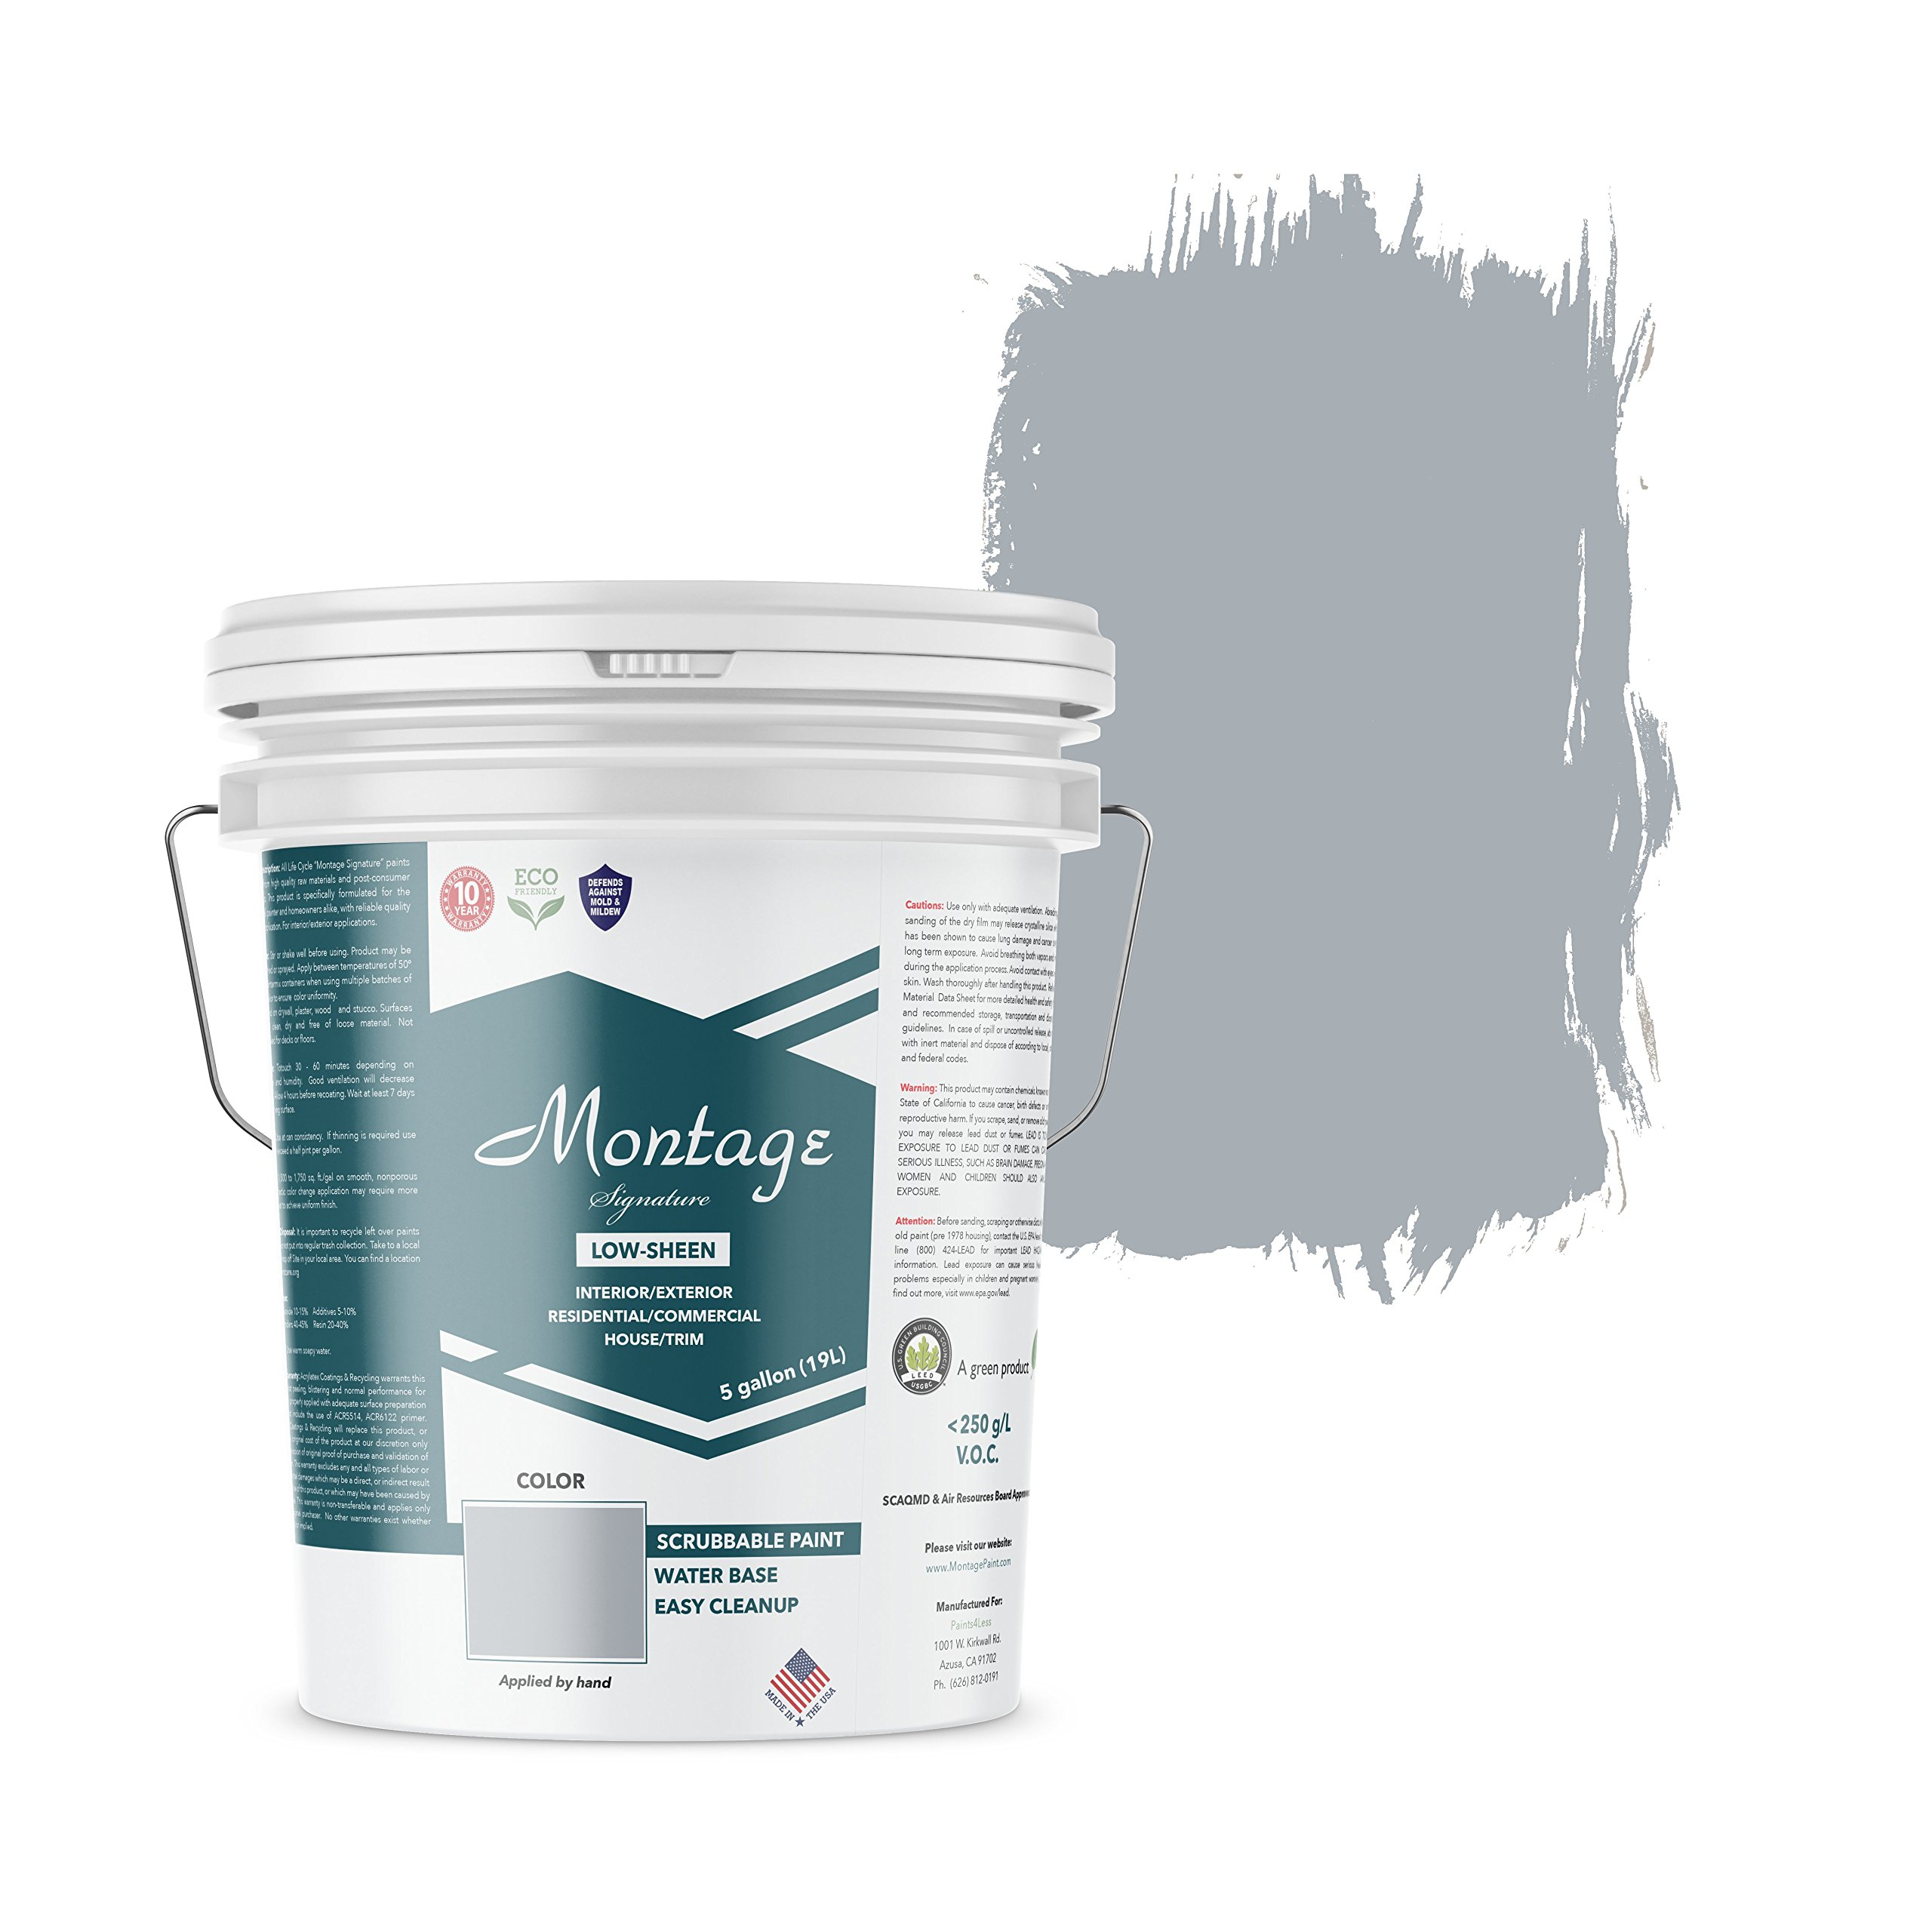 Montage Signature Interior/Exterior Eco-Friendly Paint, Twilight - Low Sheen, 5 Gallon